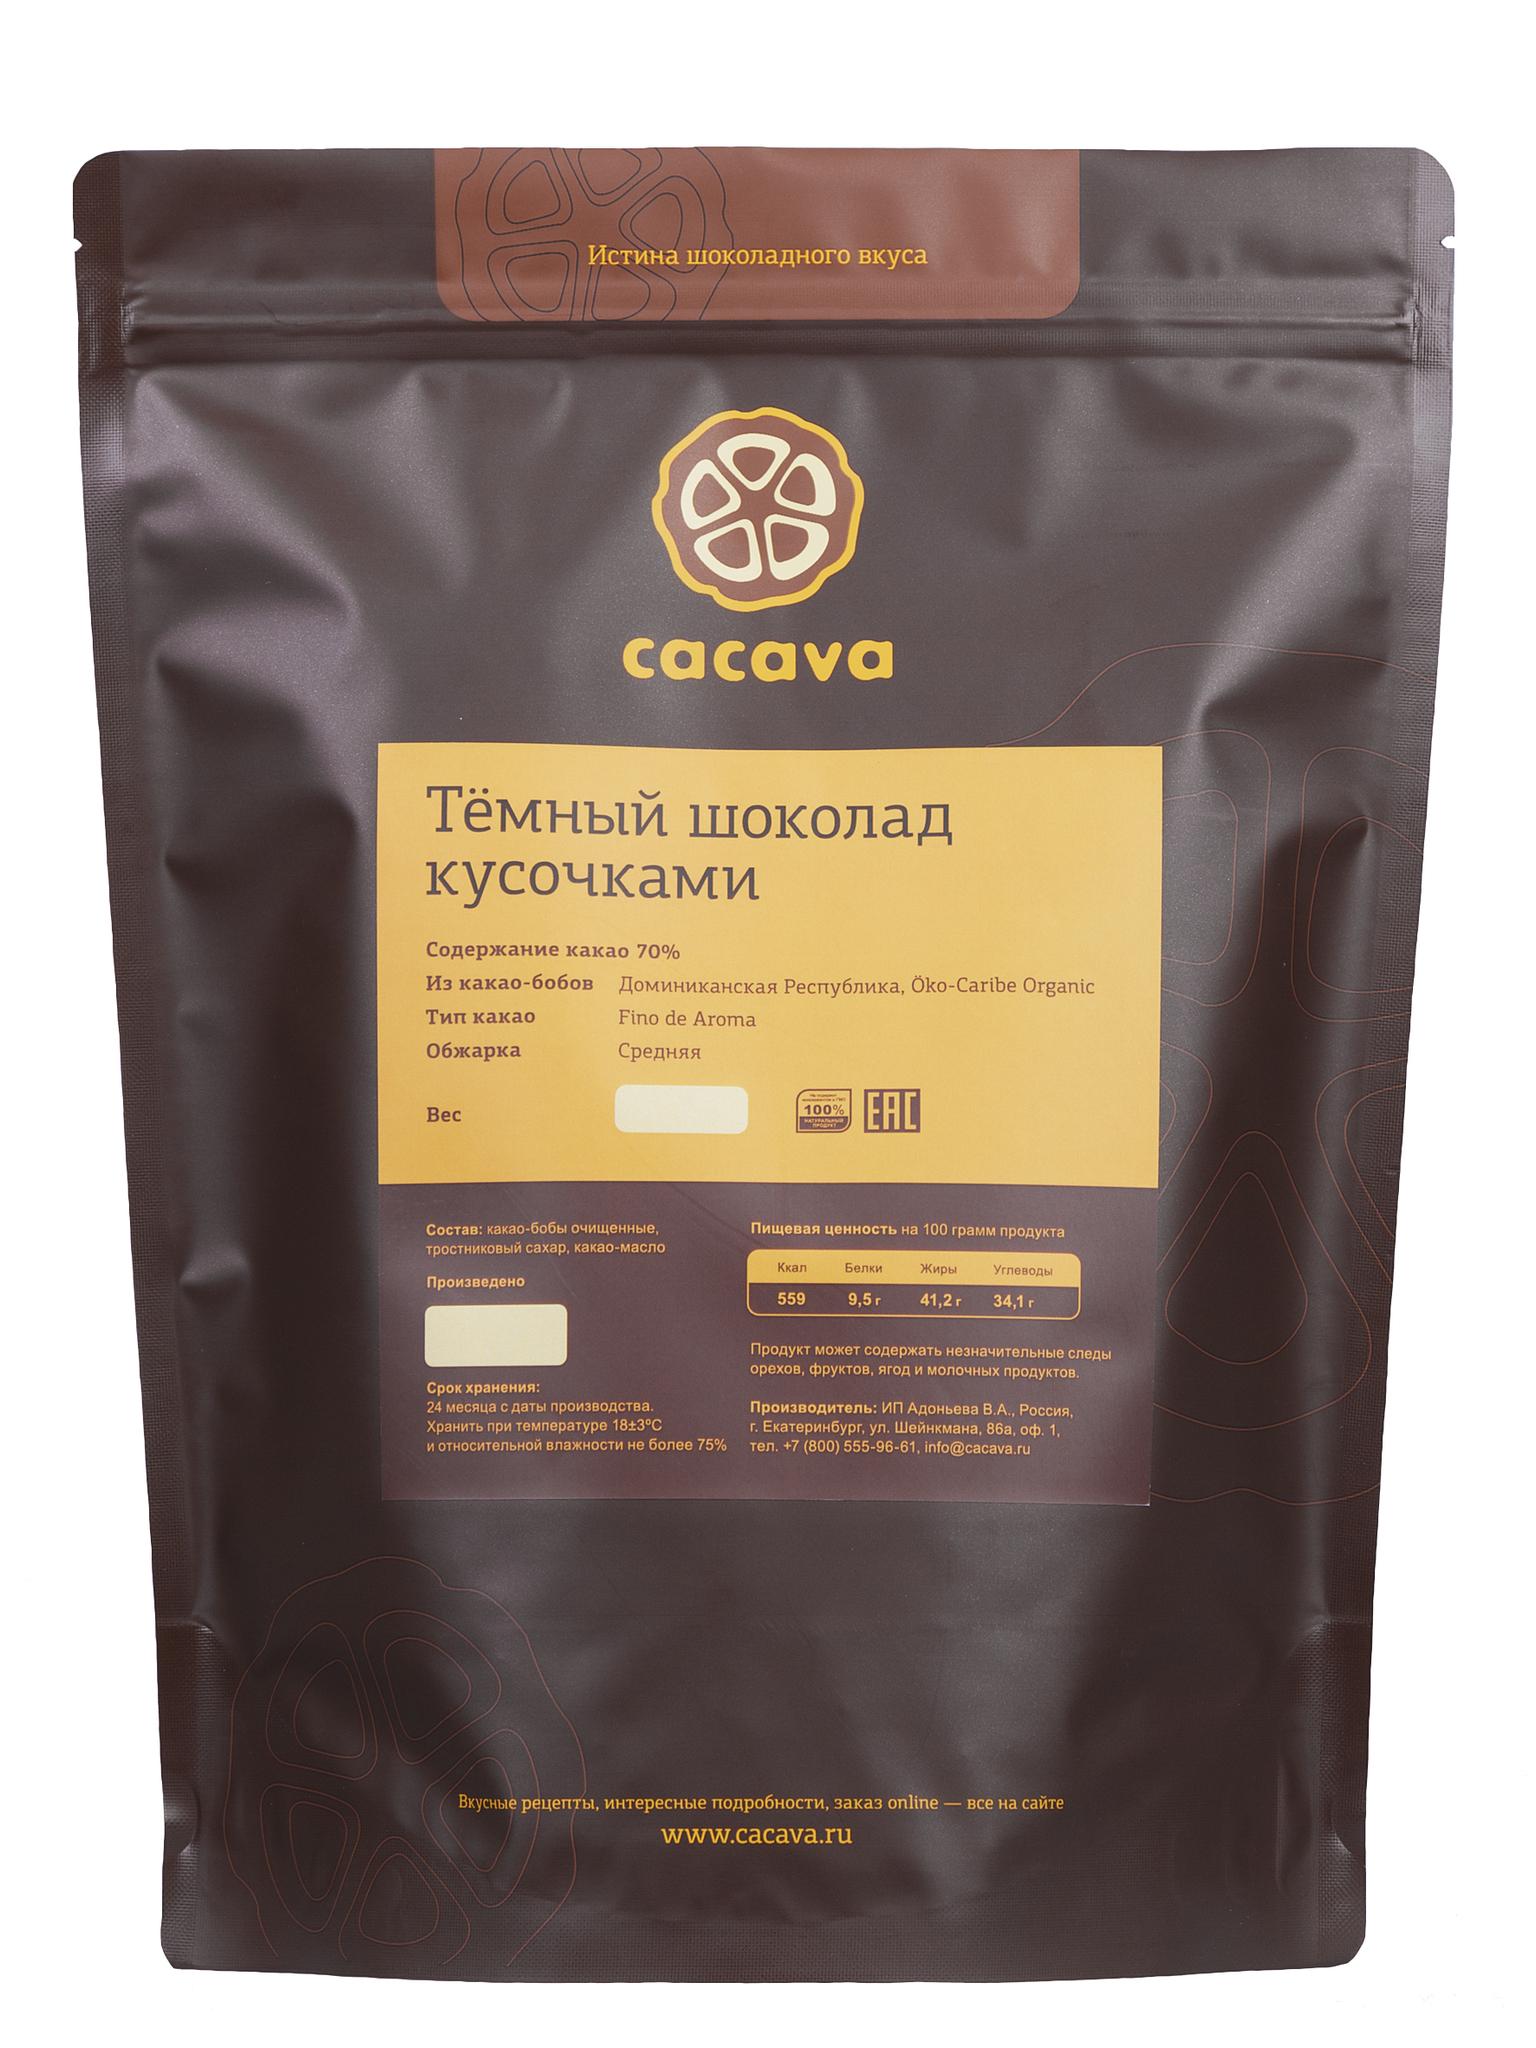 Тёмный шоколад 70 % какао (Доминикана, ÖKO CARIBE), упаковка 1 кг